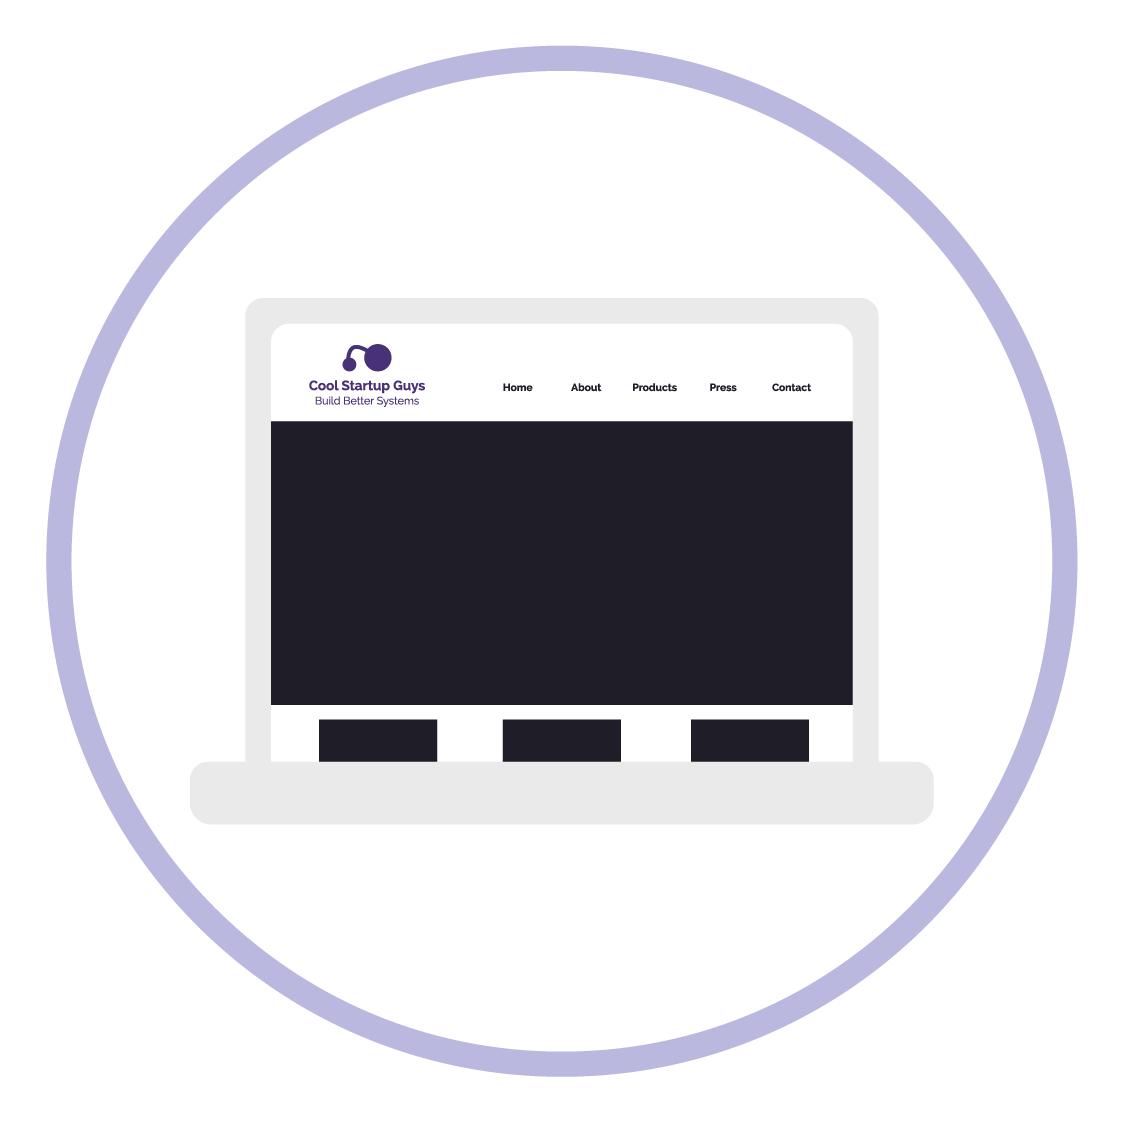 Services-Icons_Web-Design-Illustration.png